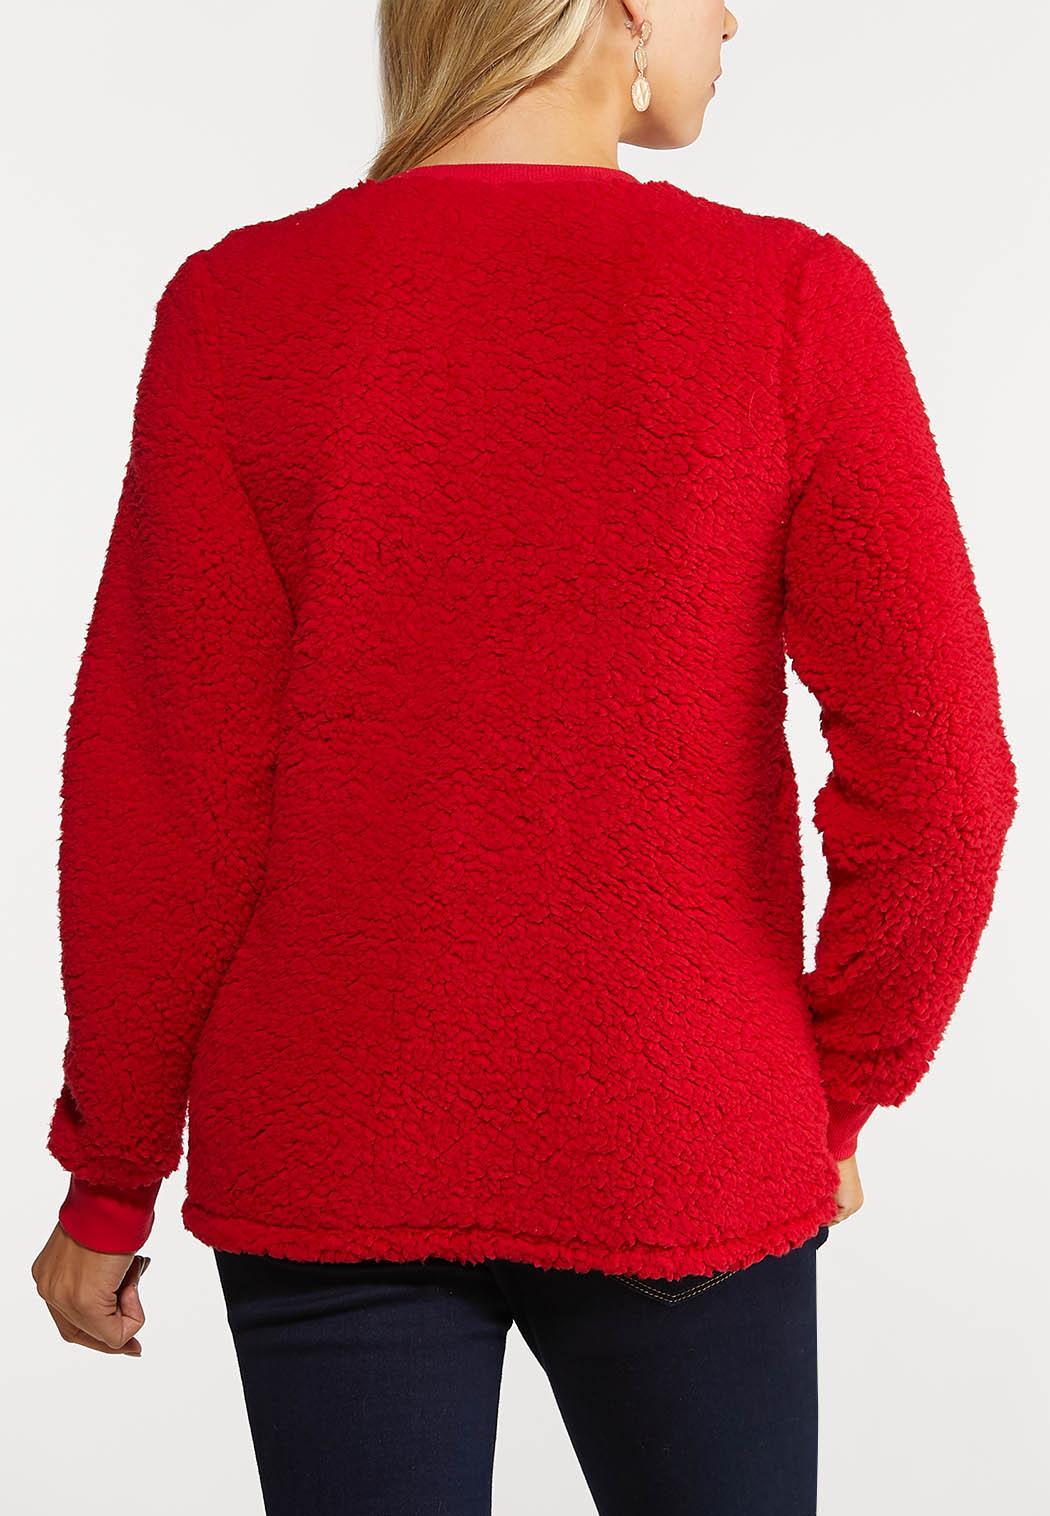 Plus Size Light Up Reindeer Sweatshirt (Item #44091805)